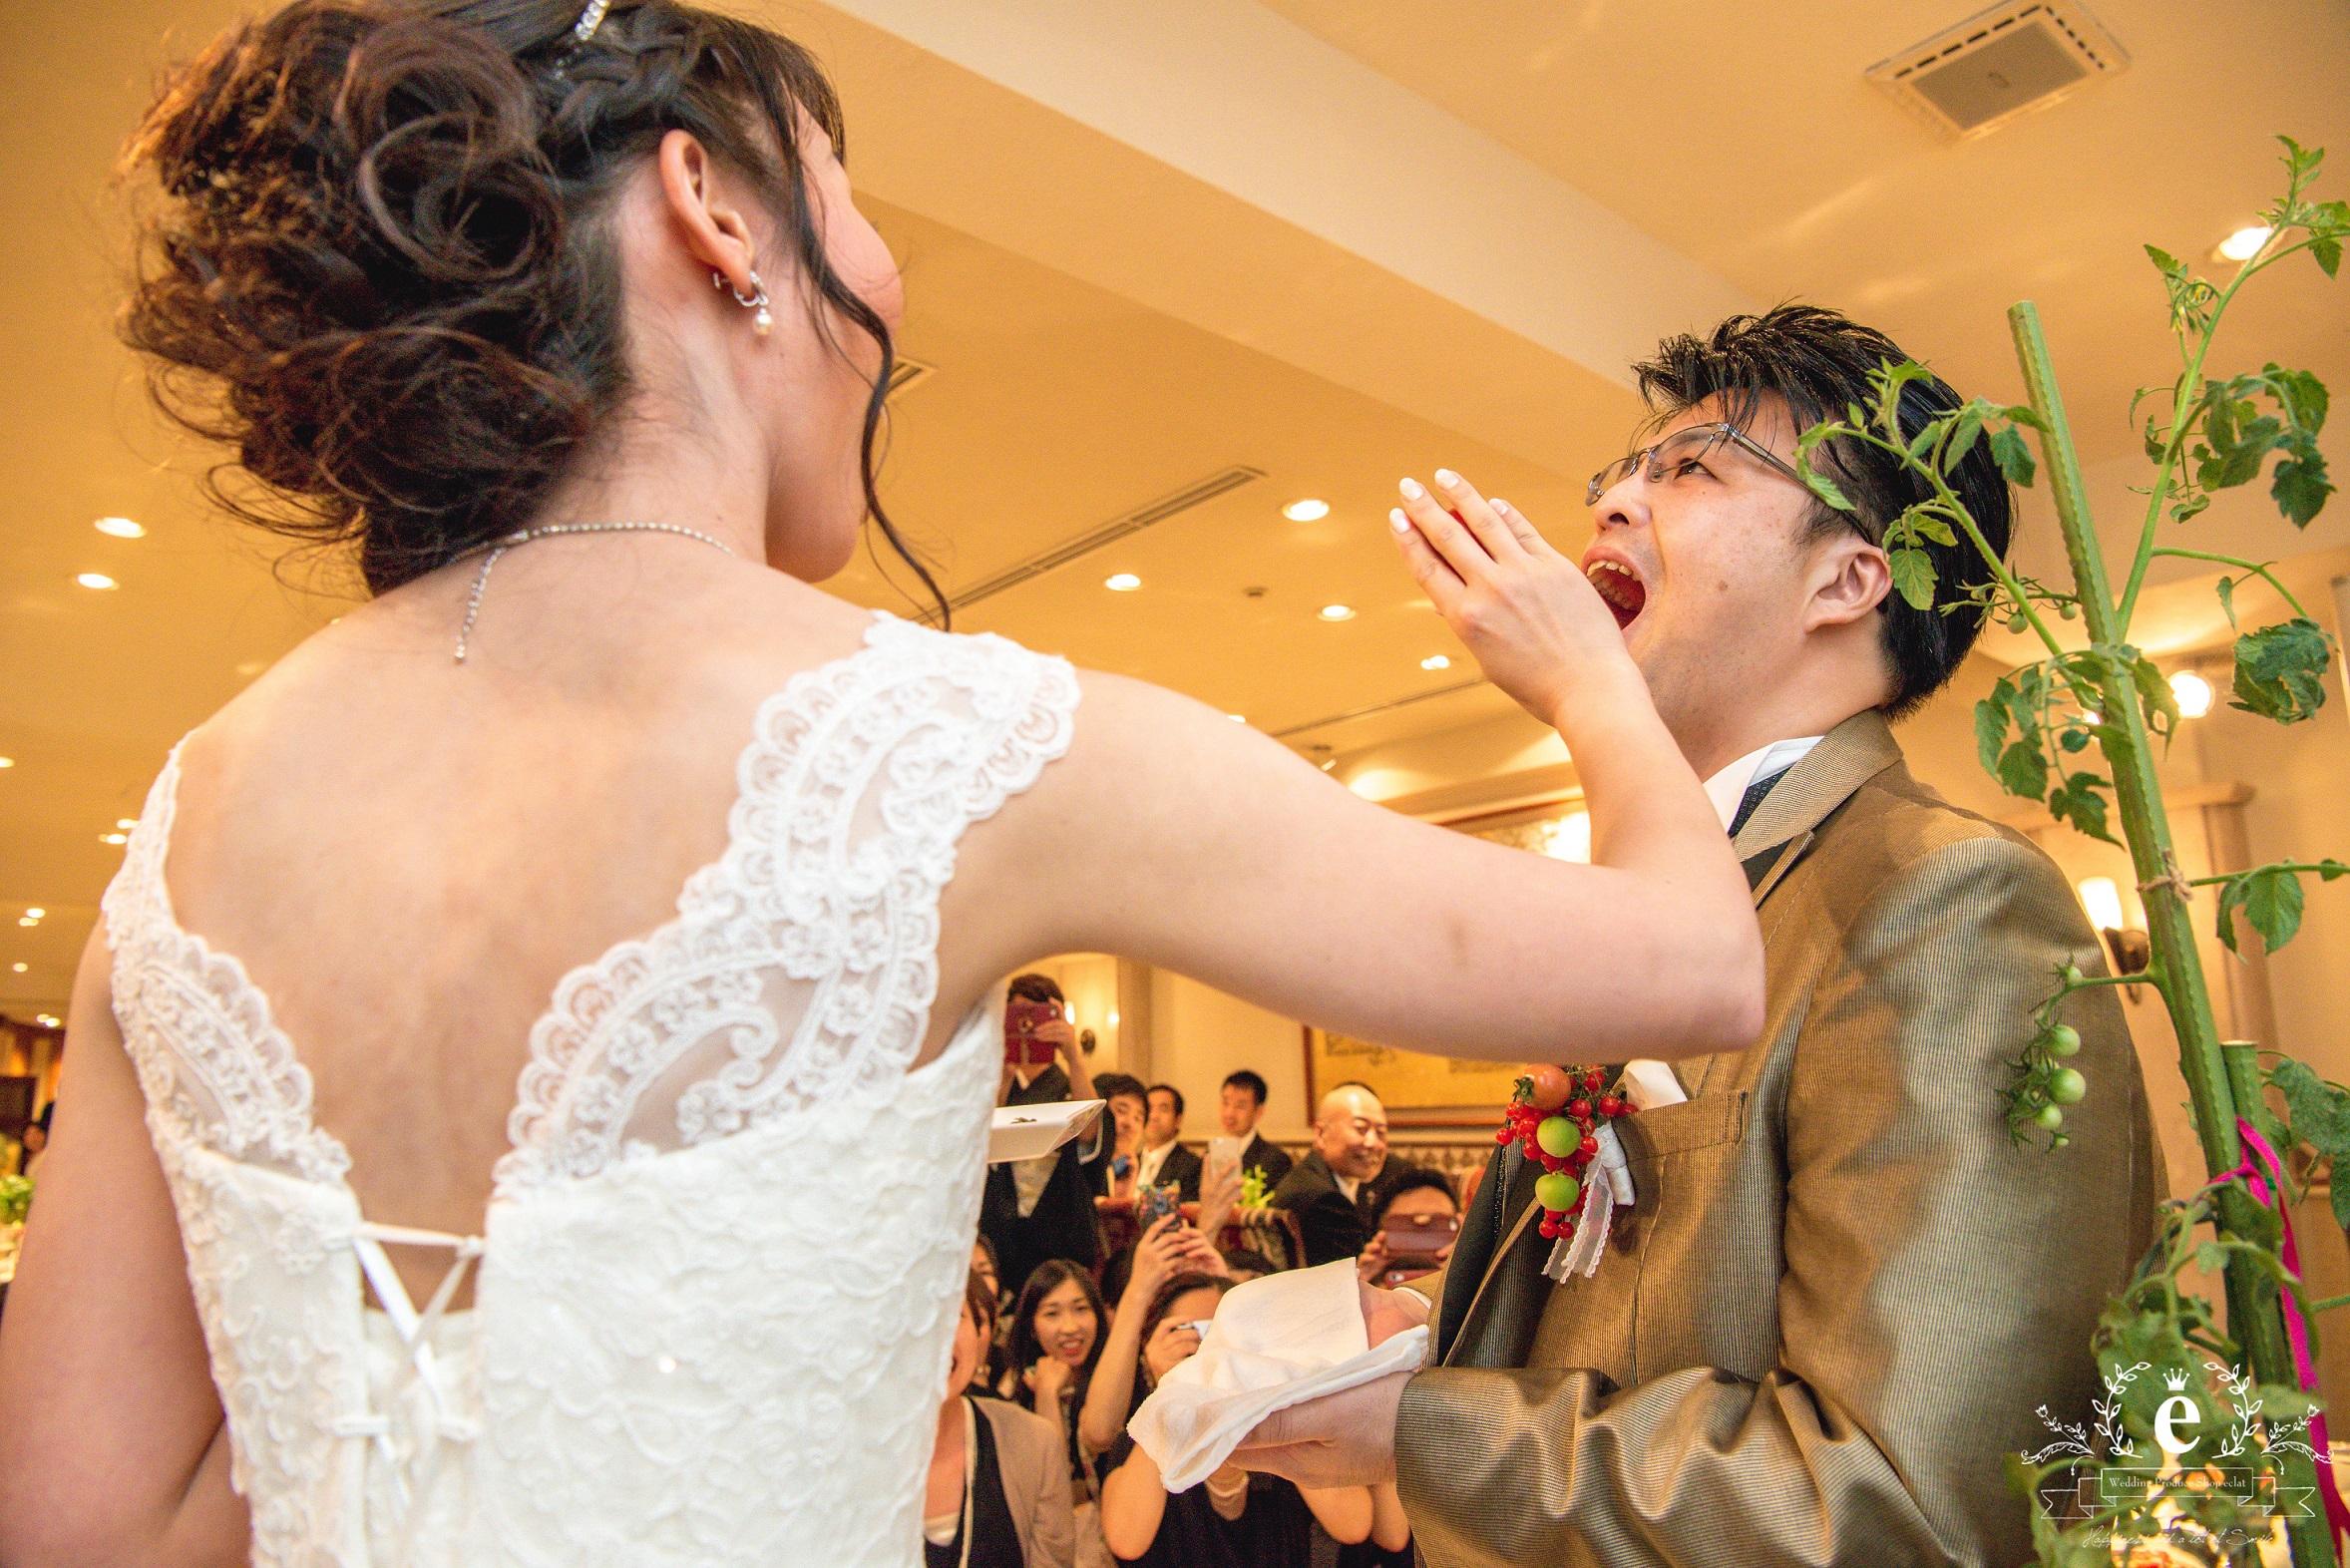 Q.E.DCLUB-結婚式-東京-水戸-ベジフル-ウェディング-野菜-オリジナル-オーダー-エクラ